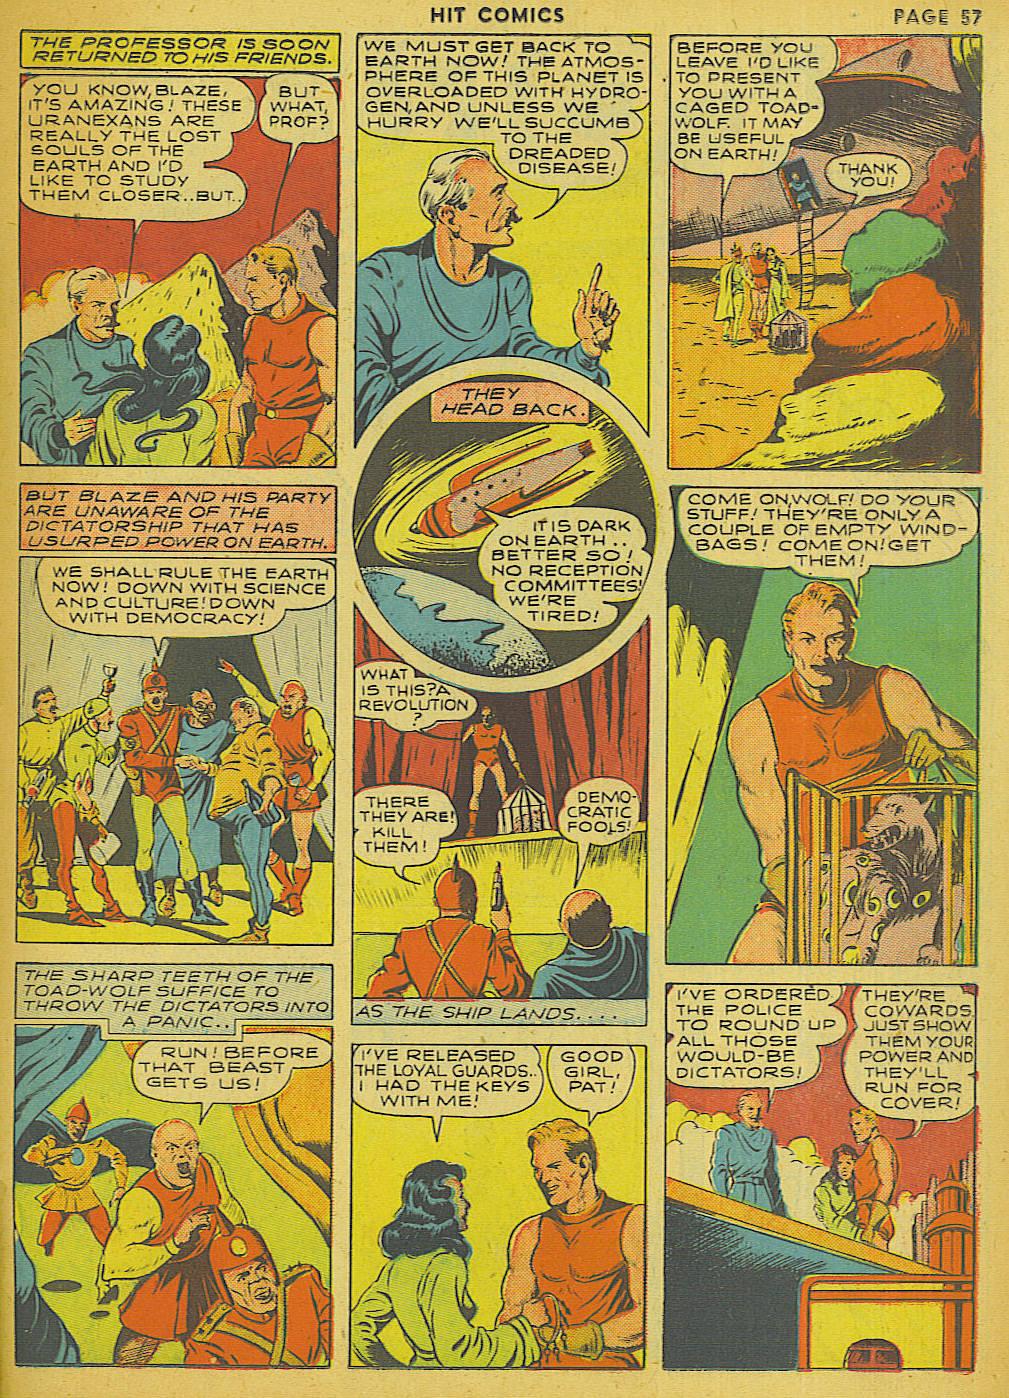 Read online Hit Comics comic -  Issue #13 - 59